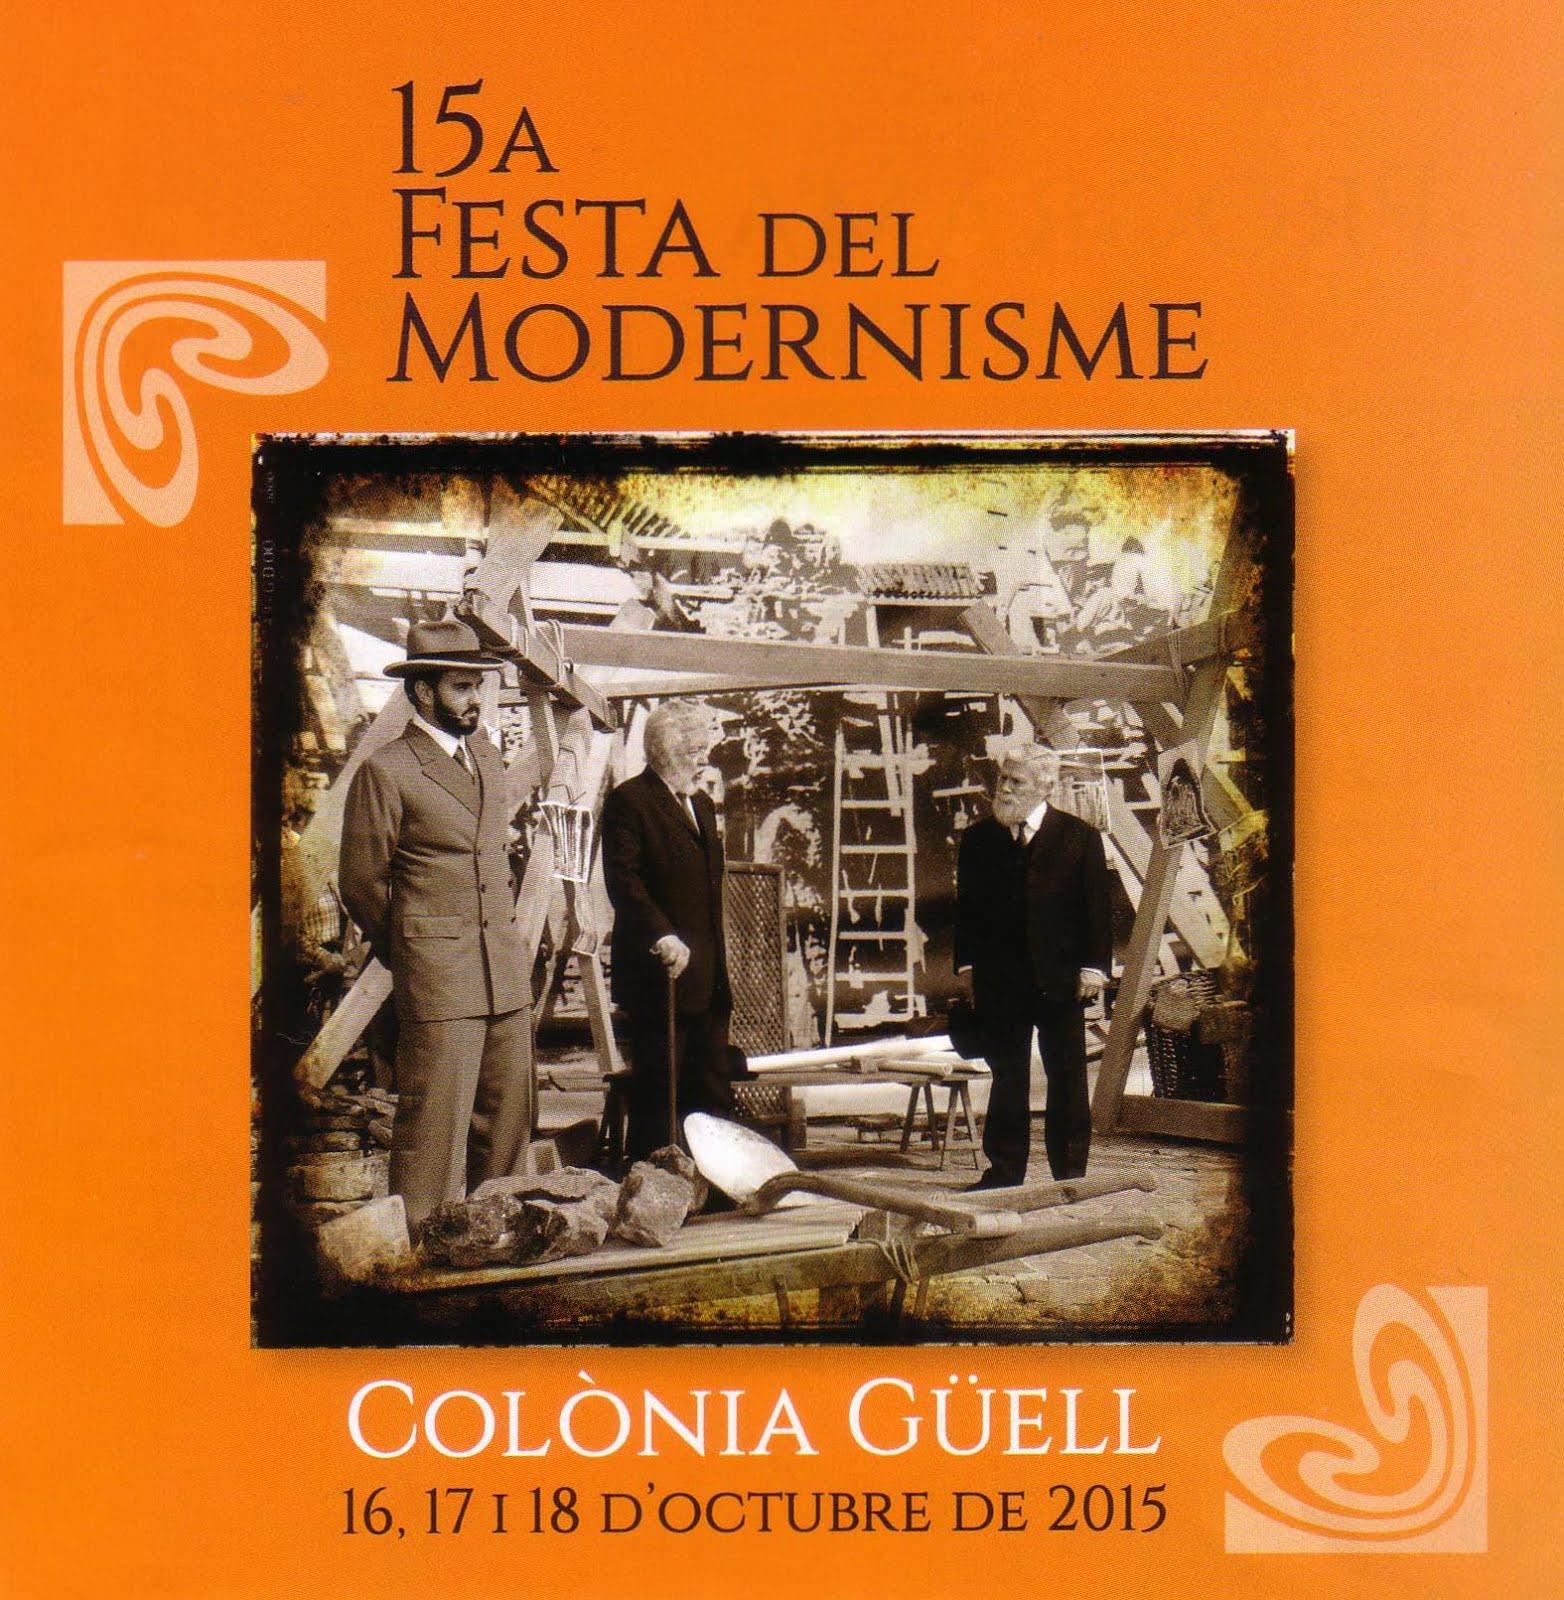 Cartell de la festa del modernisma